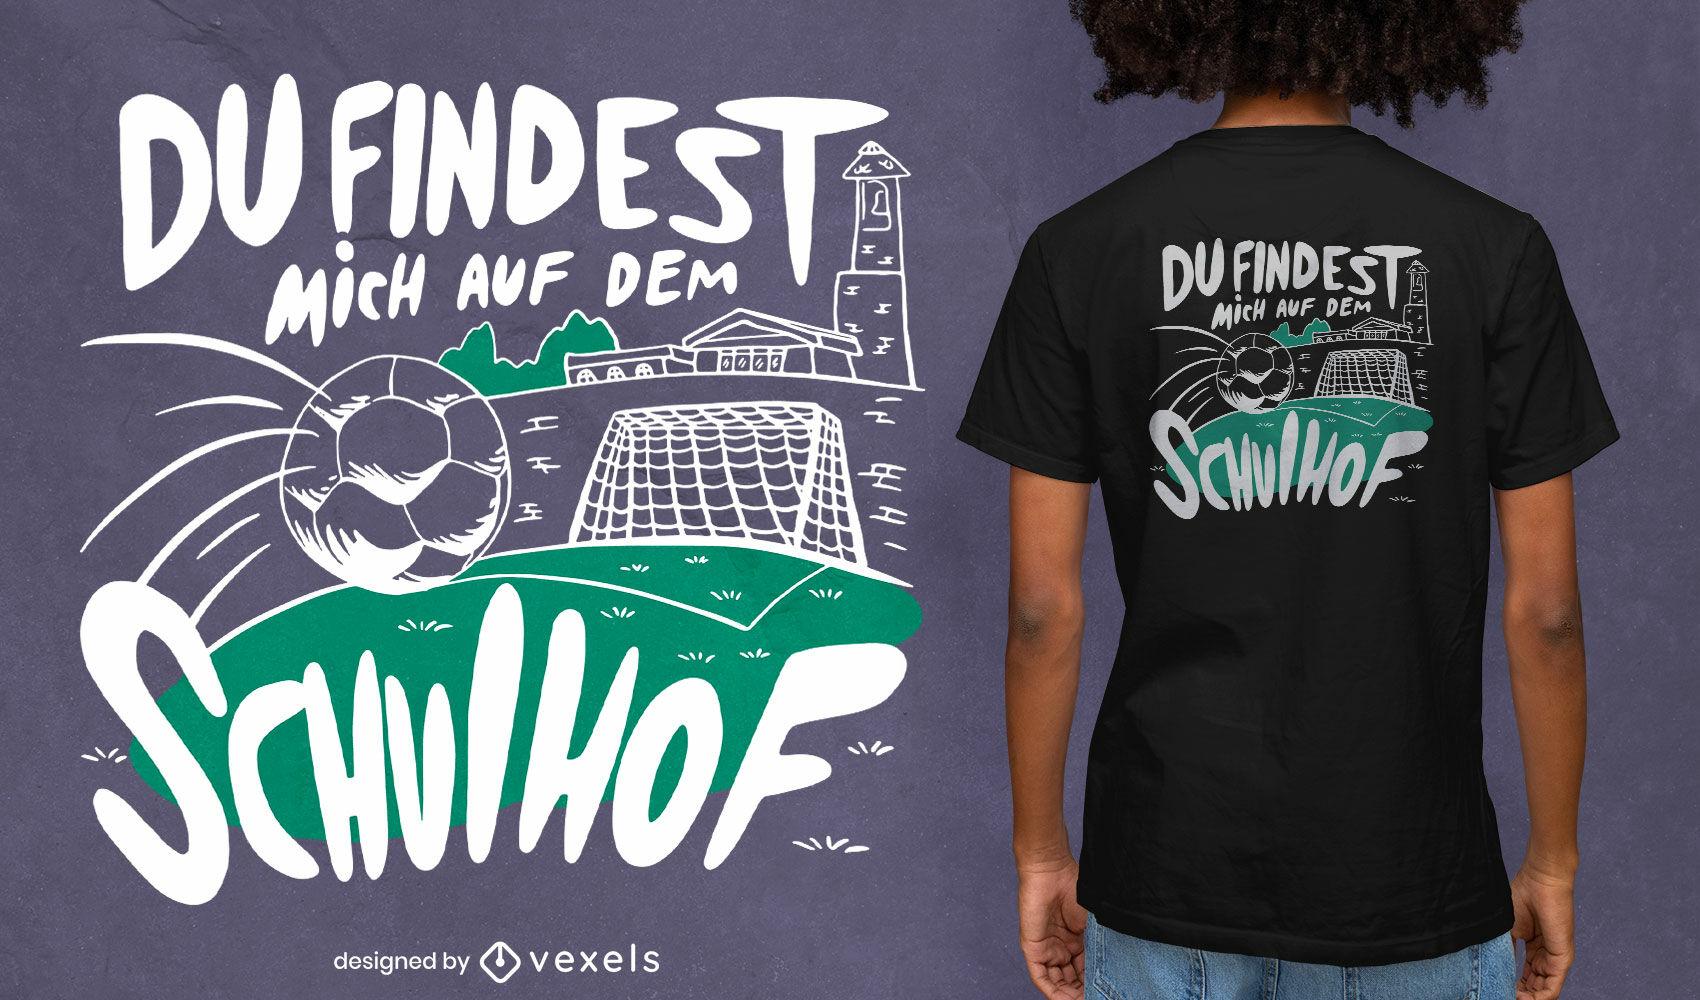 Schoolyard german quote t-shirt design